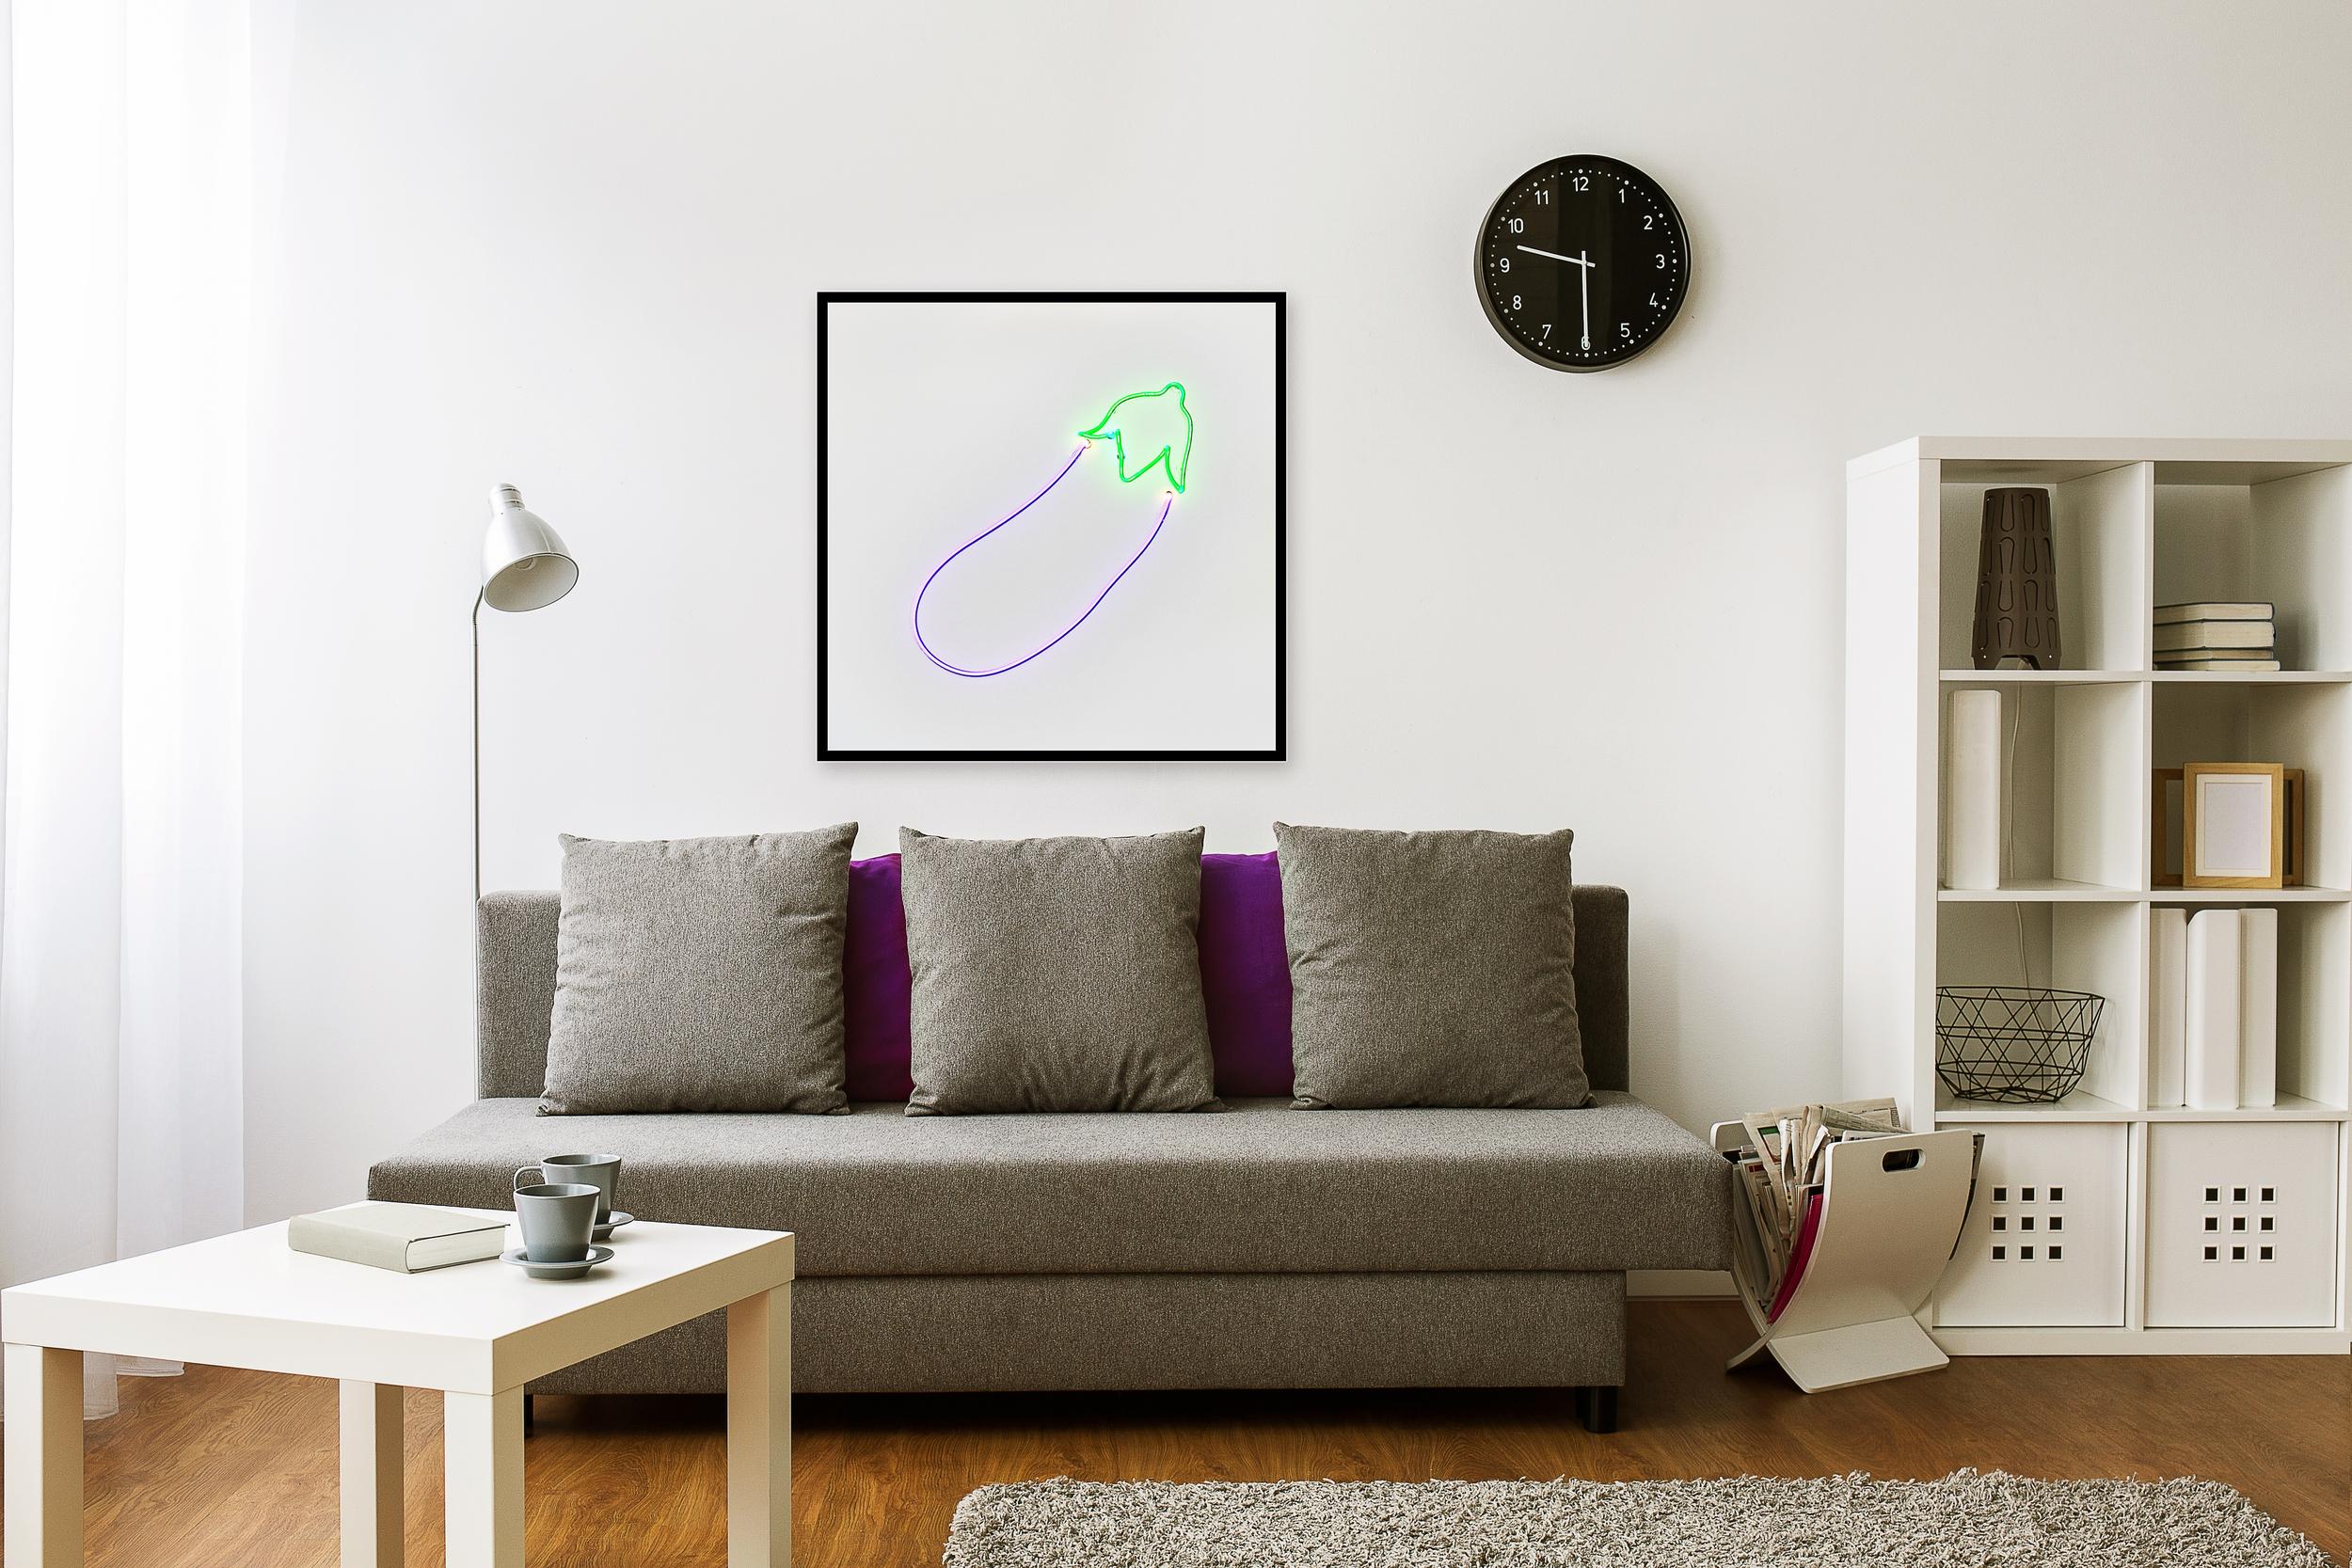 Bright living room for those who seek harmony